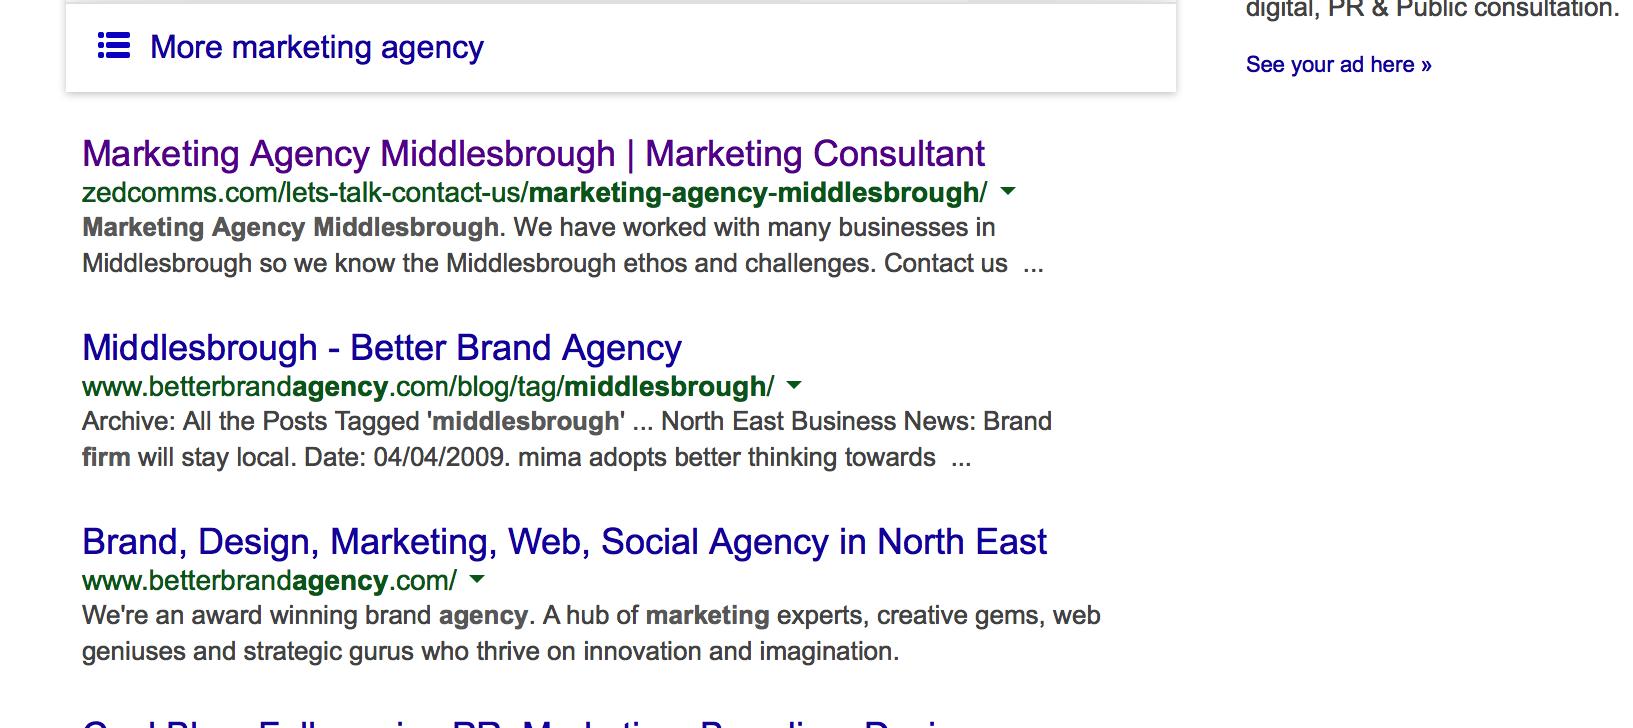 SS Marketing agency Middlesbrough